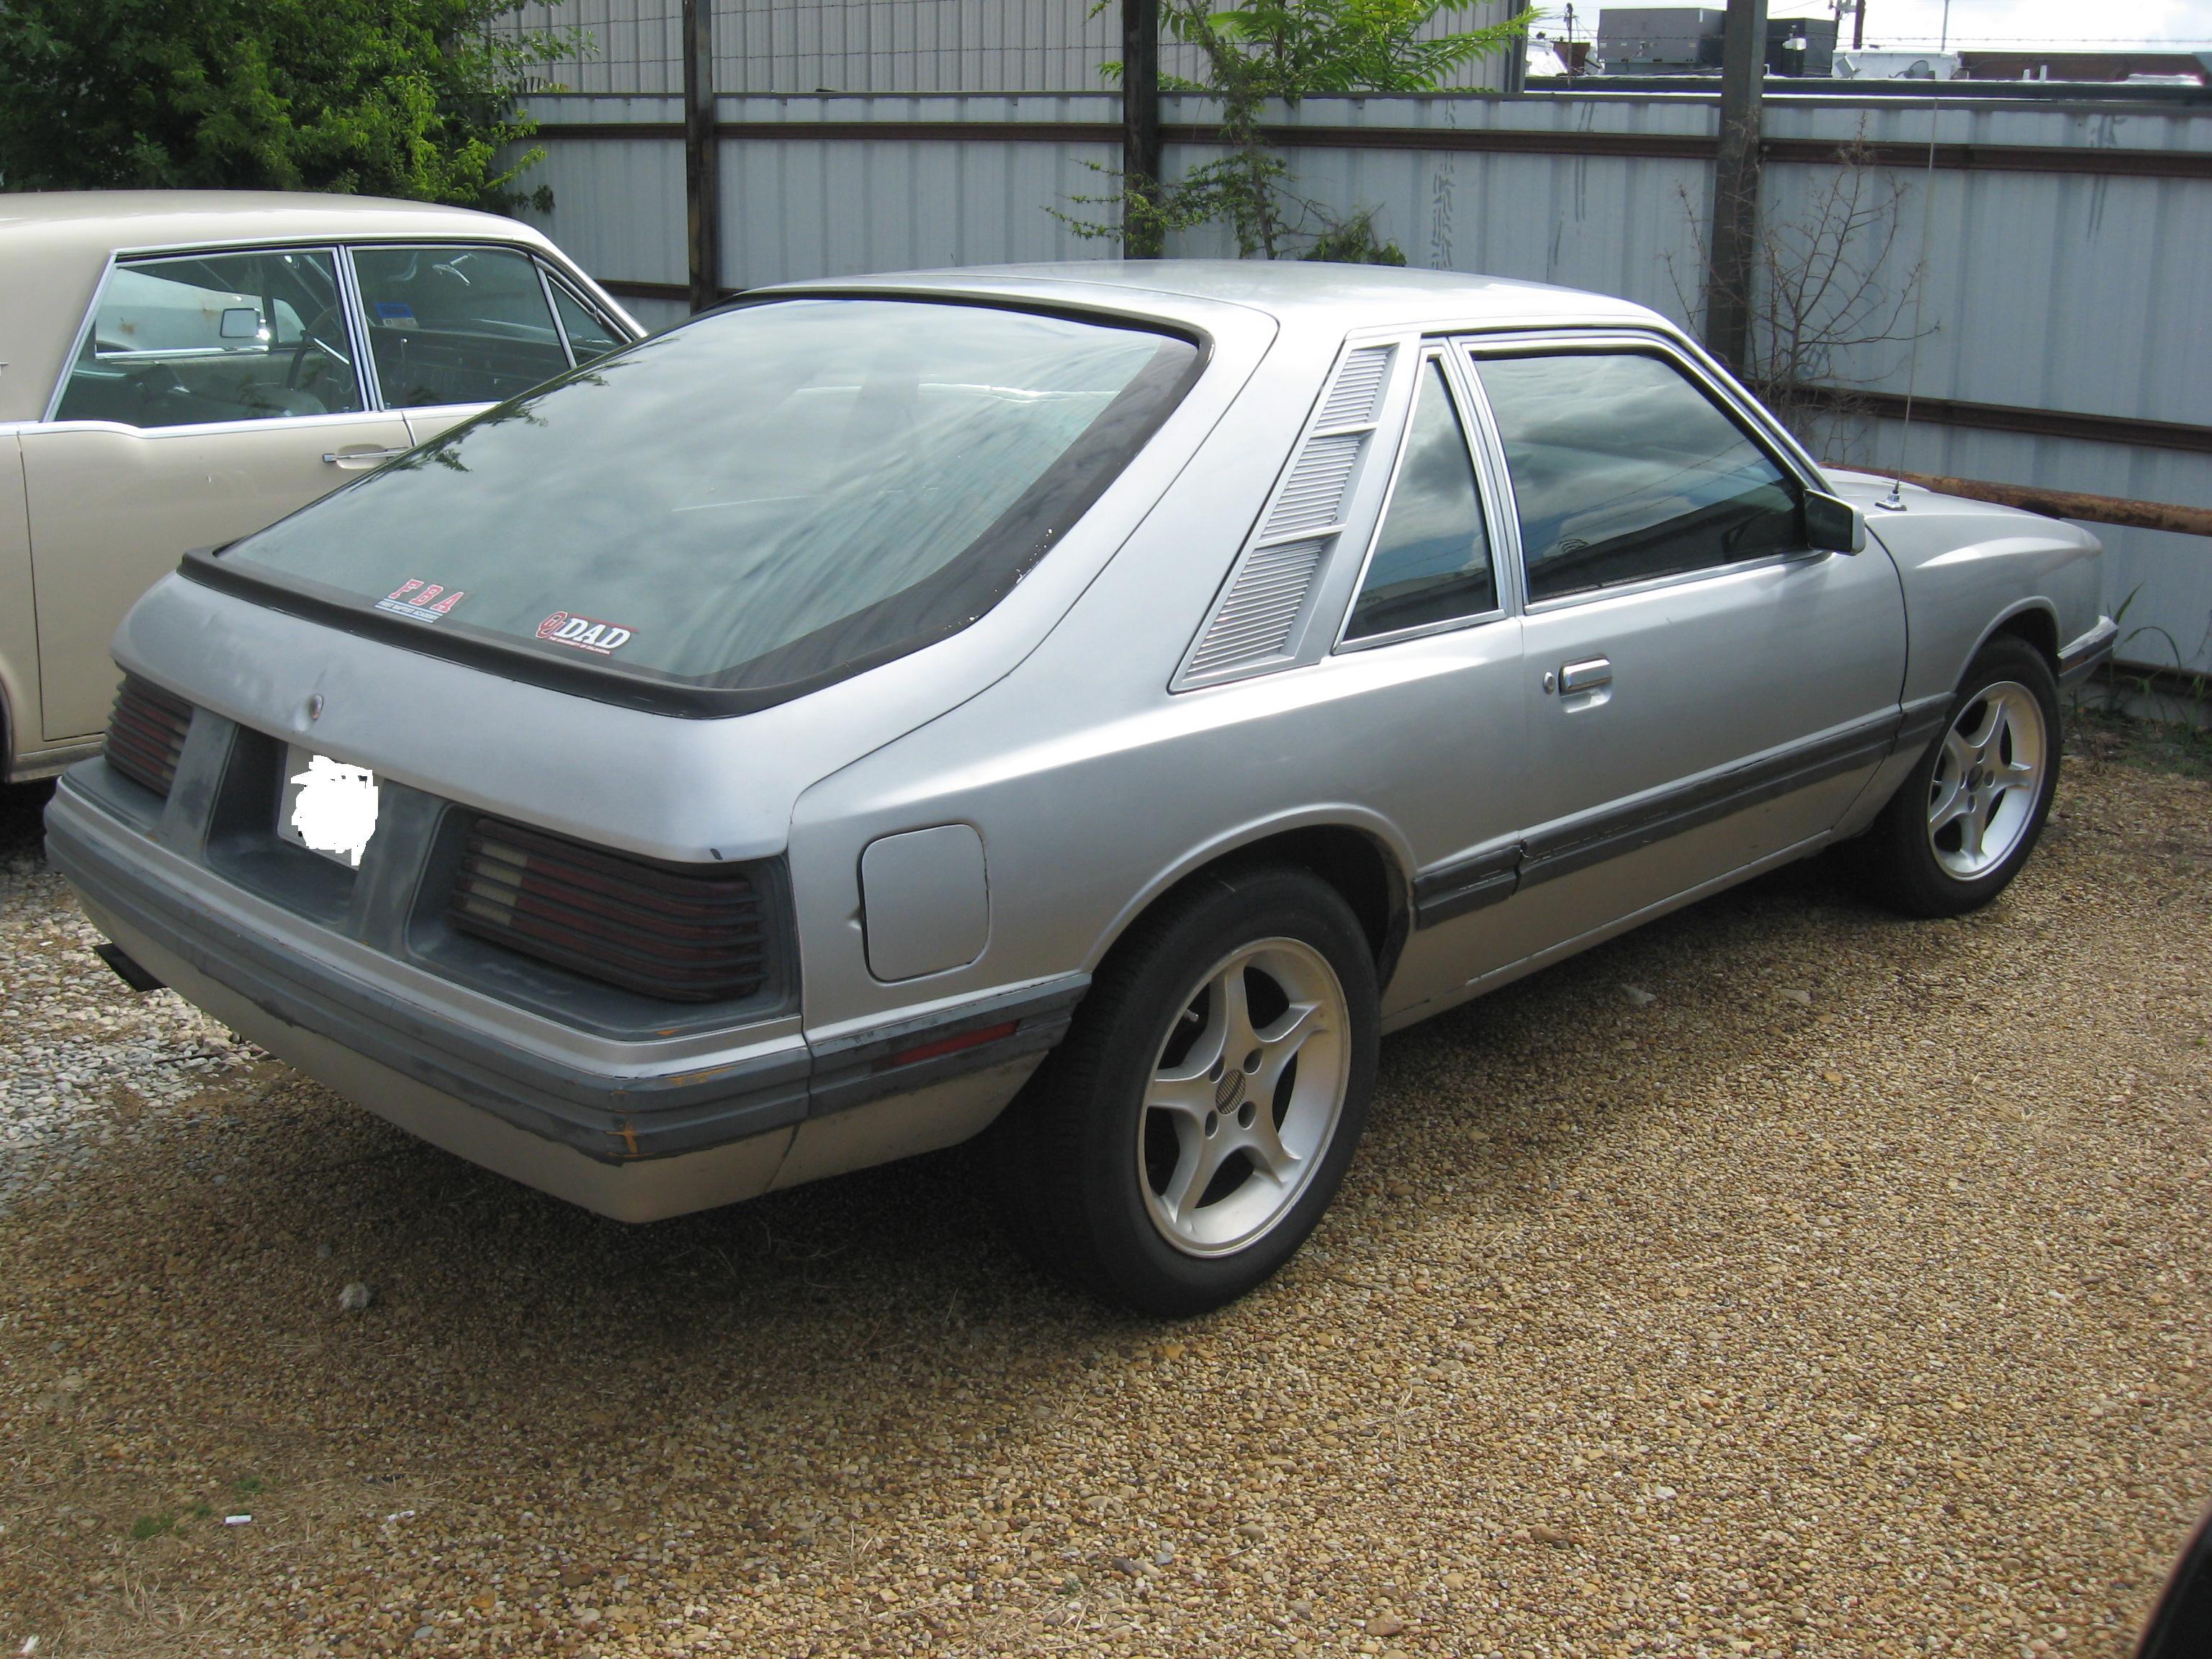 1984 Mercury Capri Wilson S Auto Restoration Blog Wilson S Auto Restoration Blog